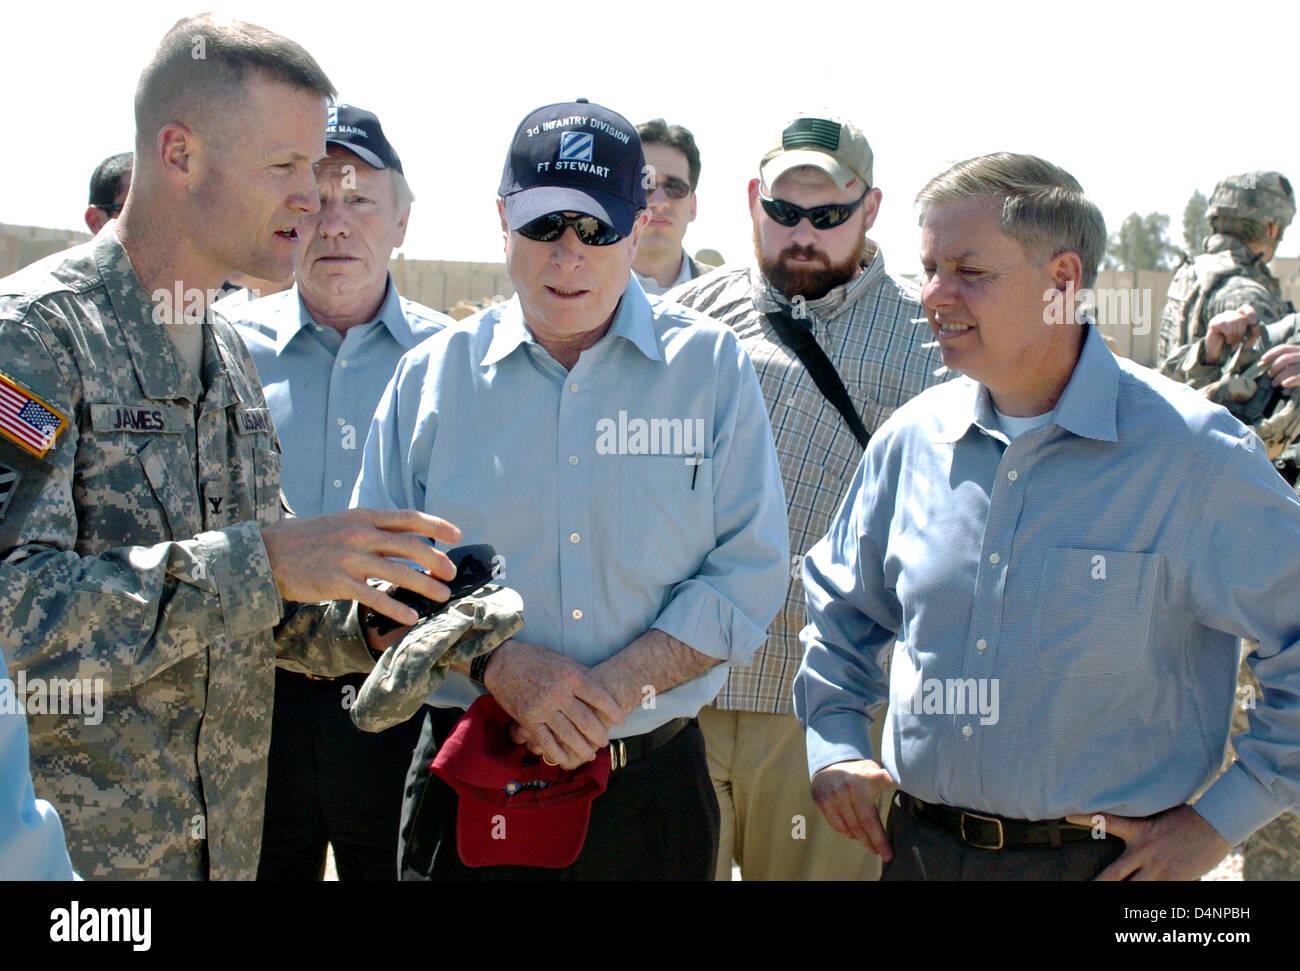 US Senator John McCain (center) listens to Col. Thomas James and Senator Joseph Lieberman (right) during a walk - Stock Image